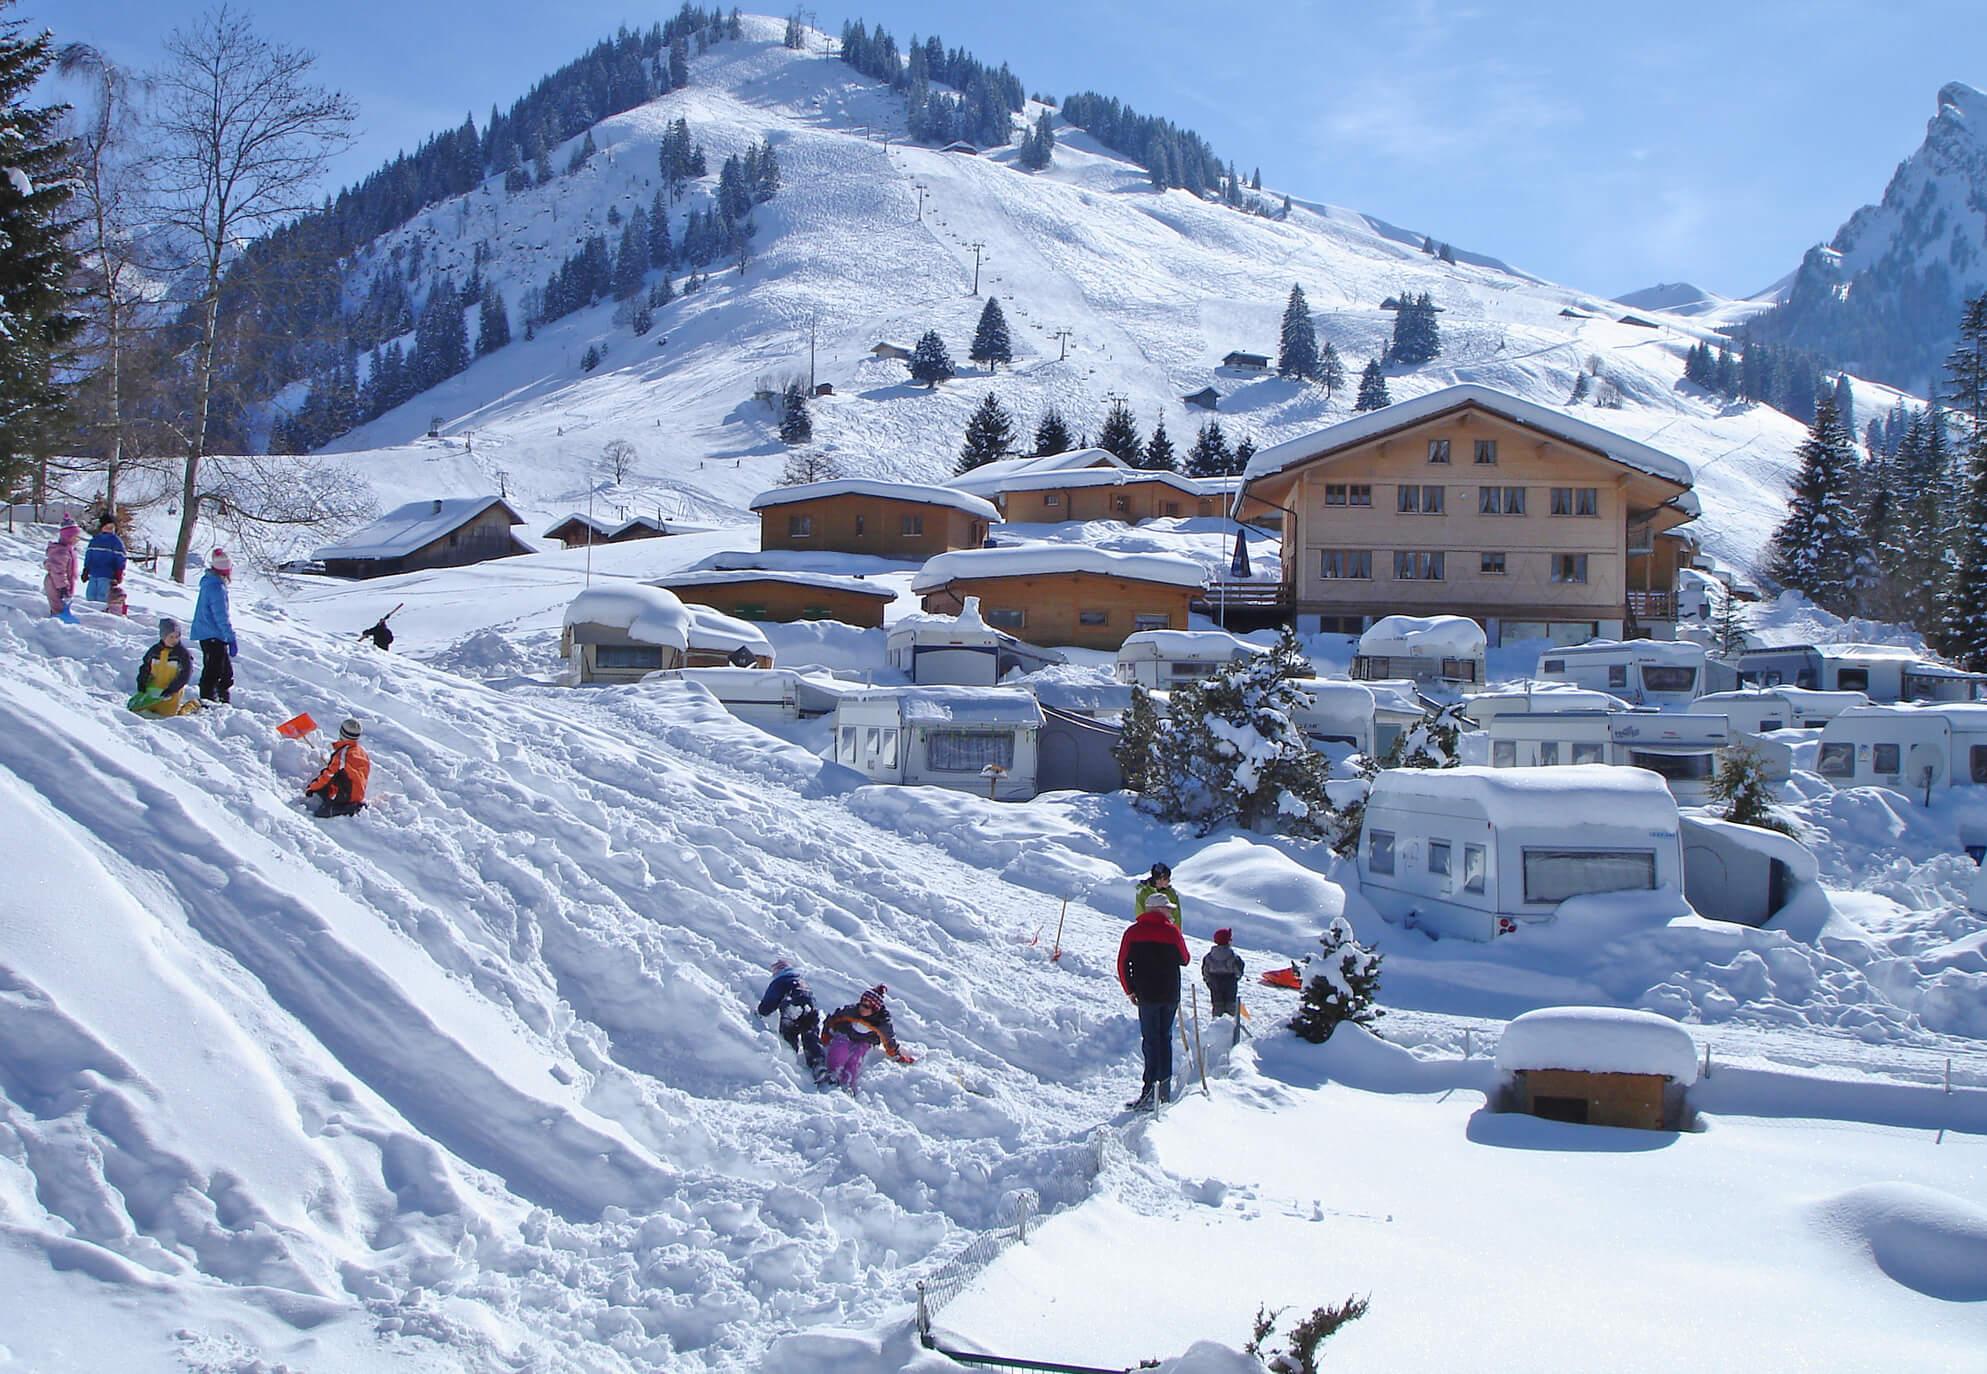 Camping Winter Camper Sessbahn Skifahren